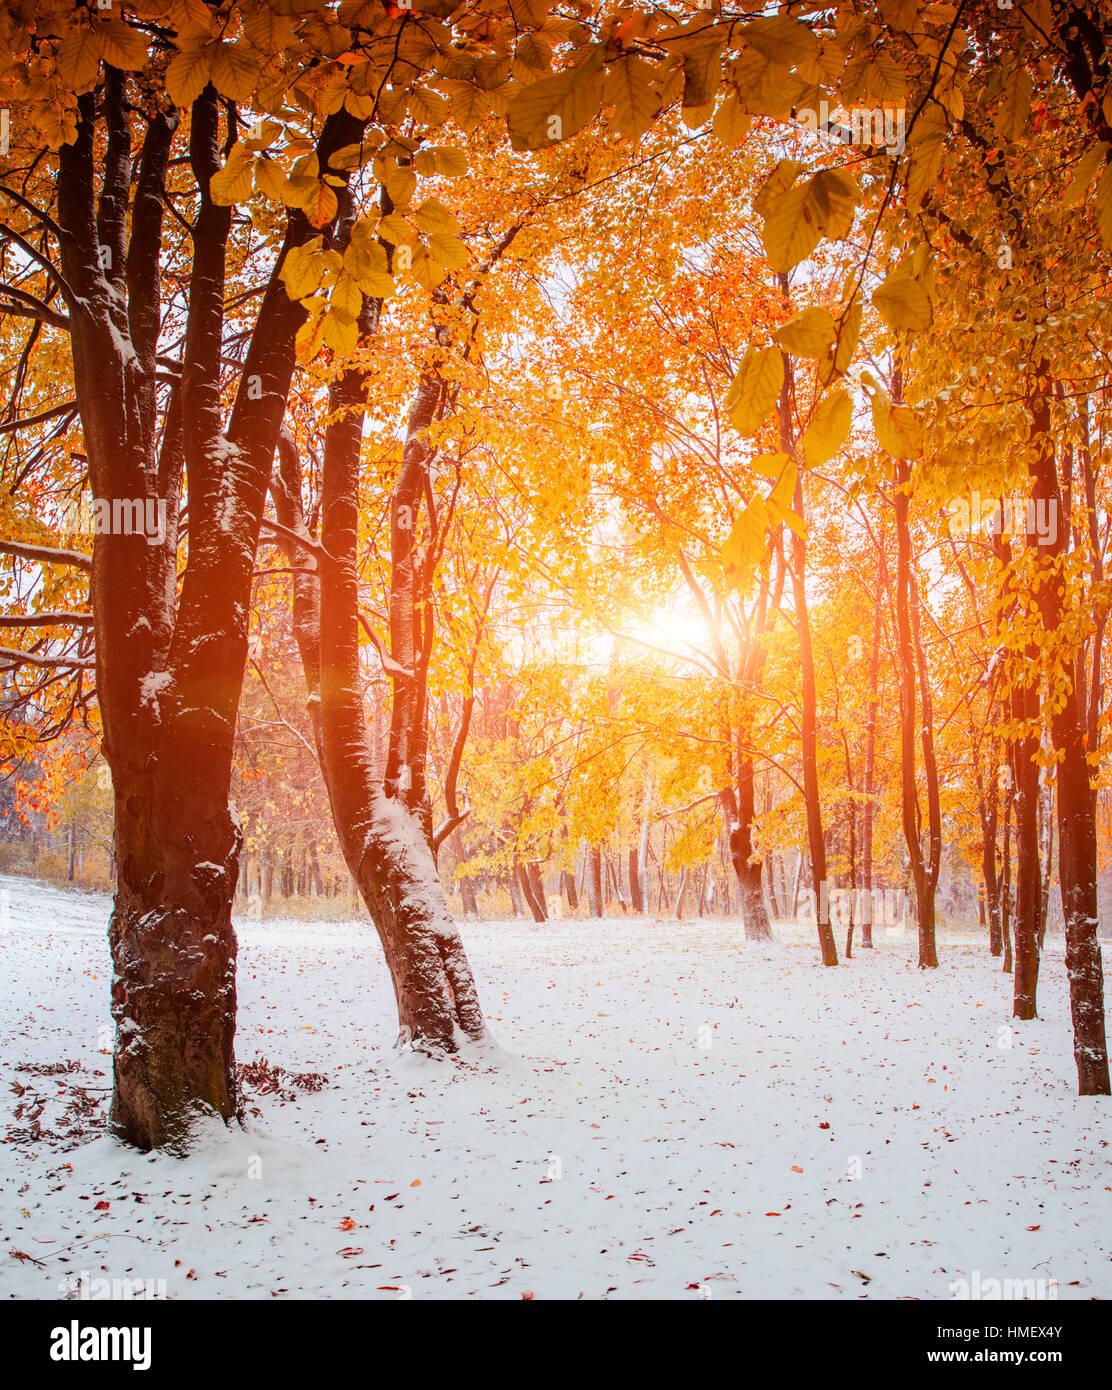 Erster Schnee im Wald Stockbild